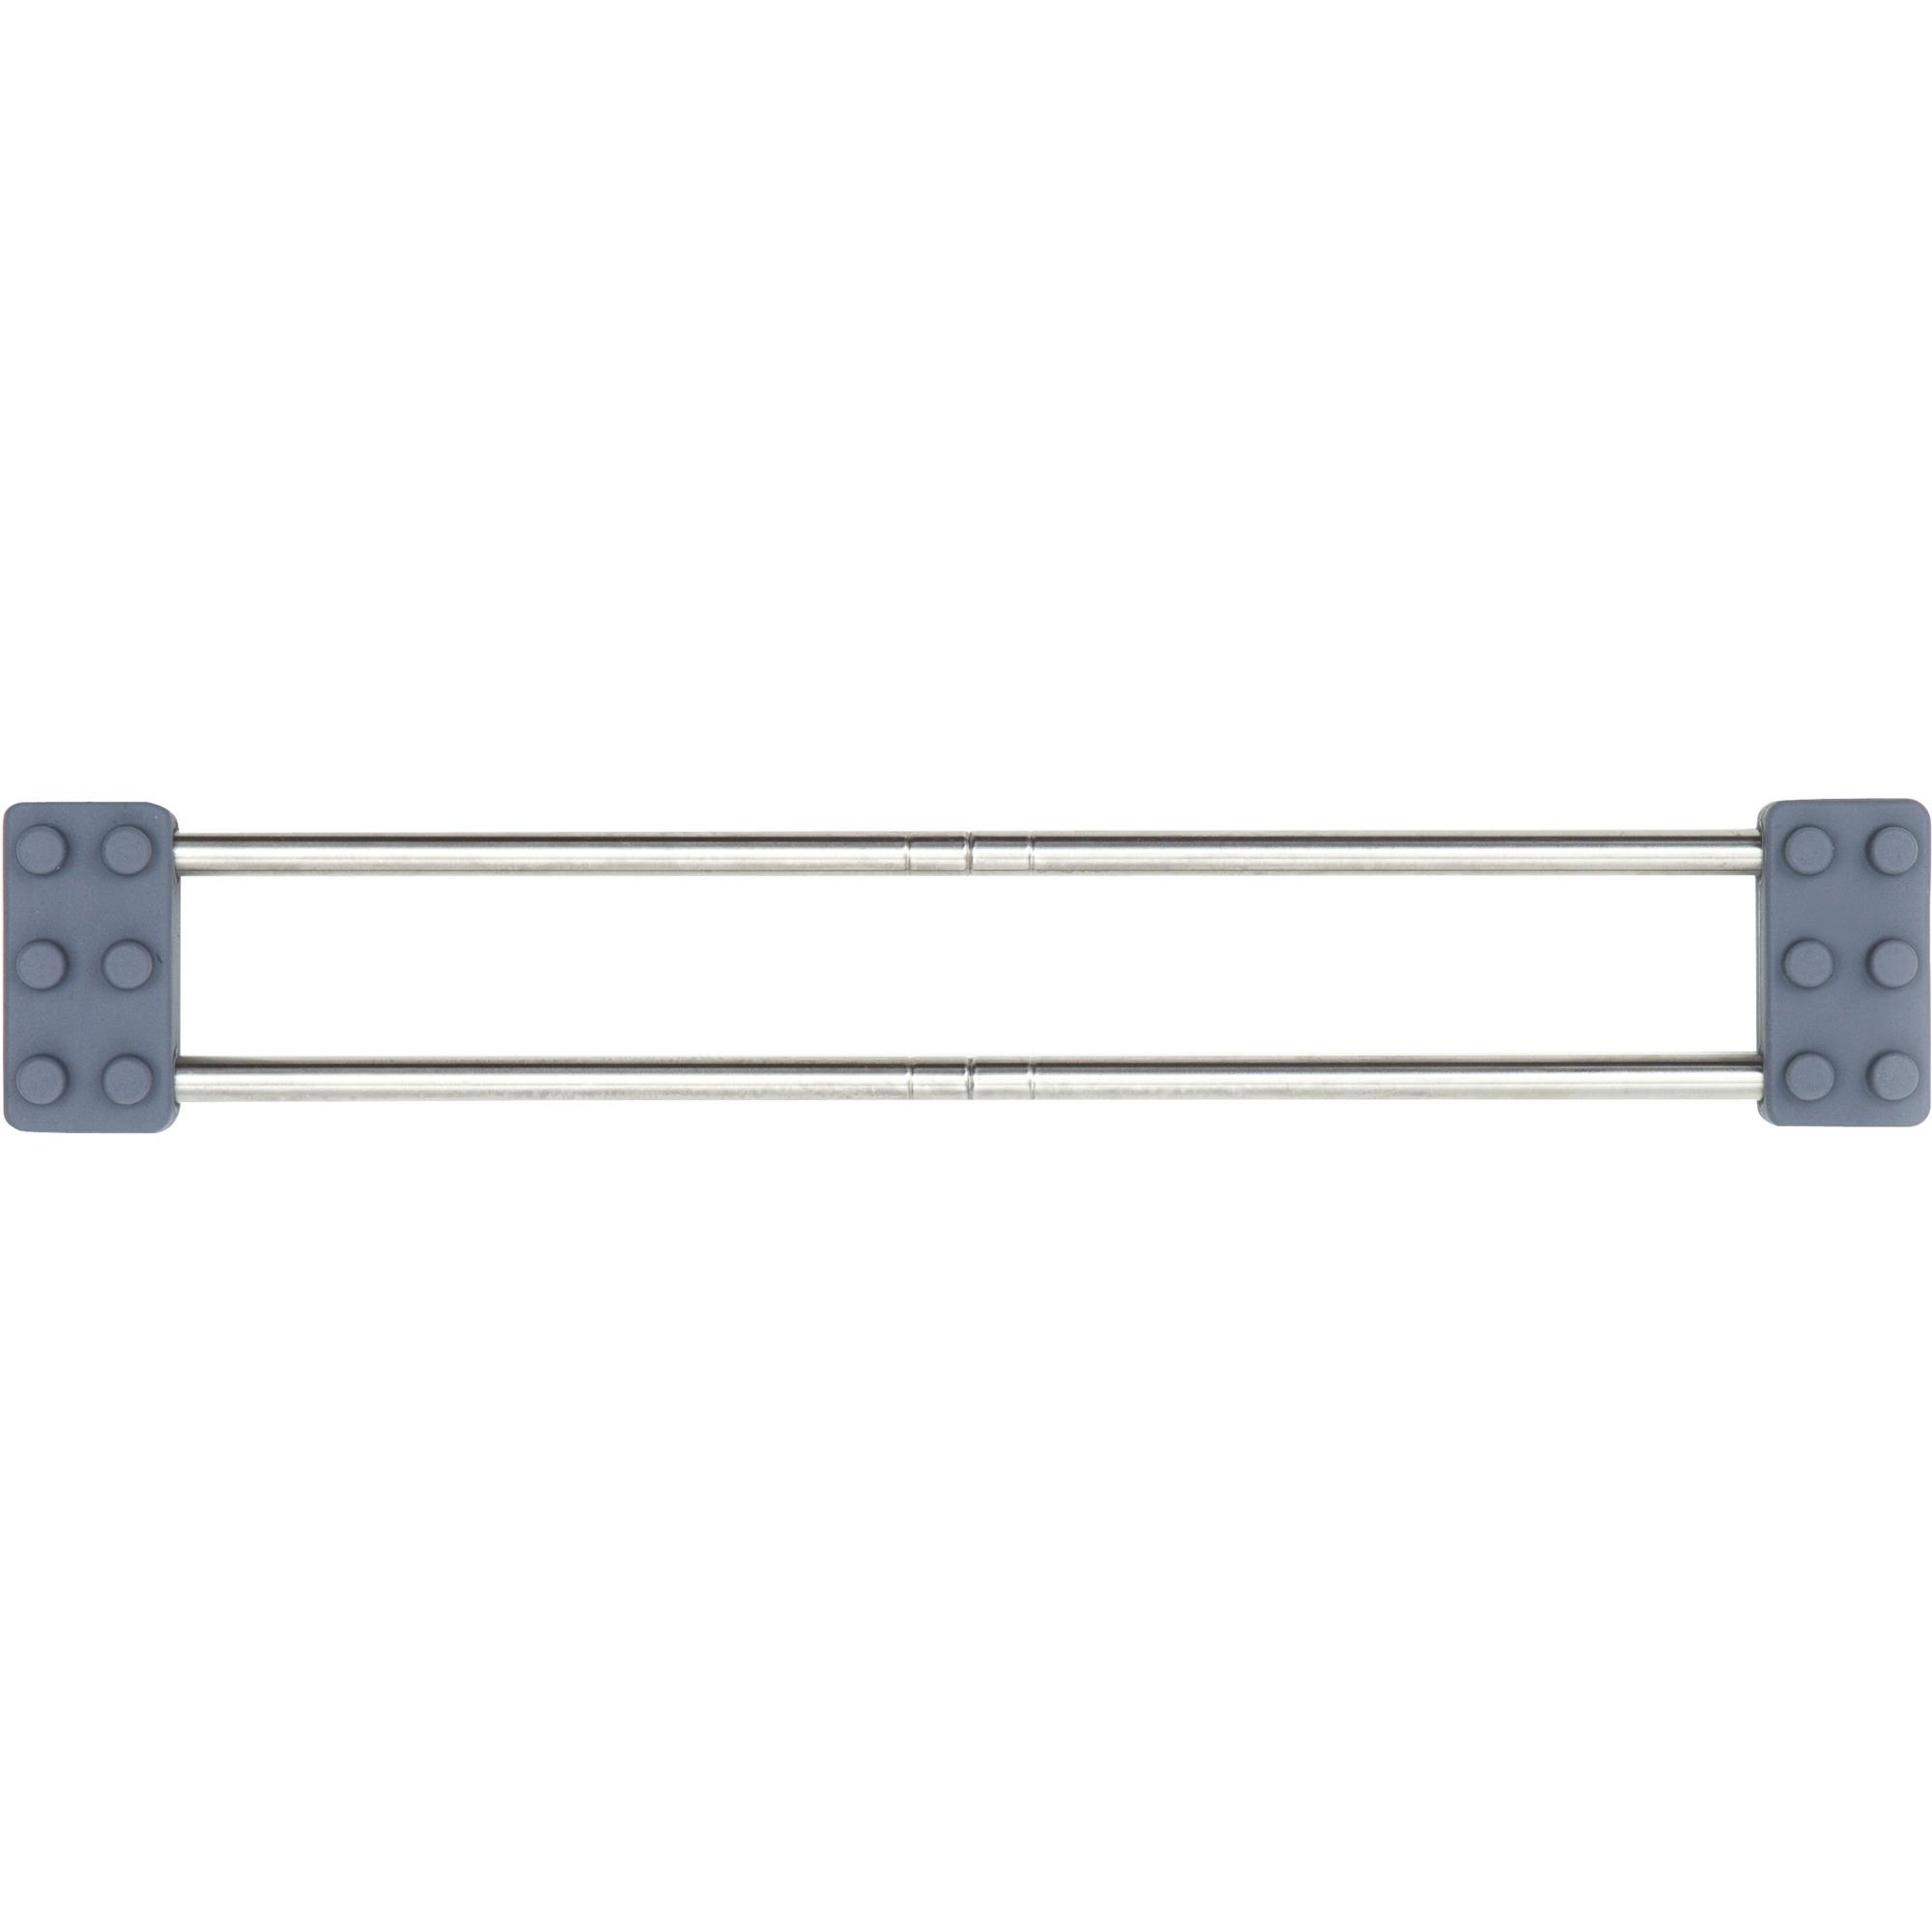 SanniShoo drip.line Abtropfhilfe, Abtropfgestell grau/silber